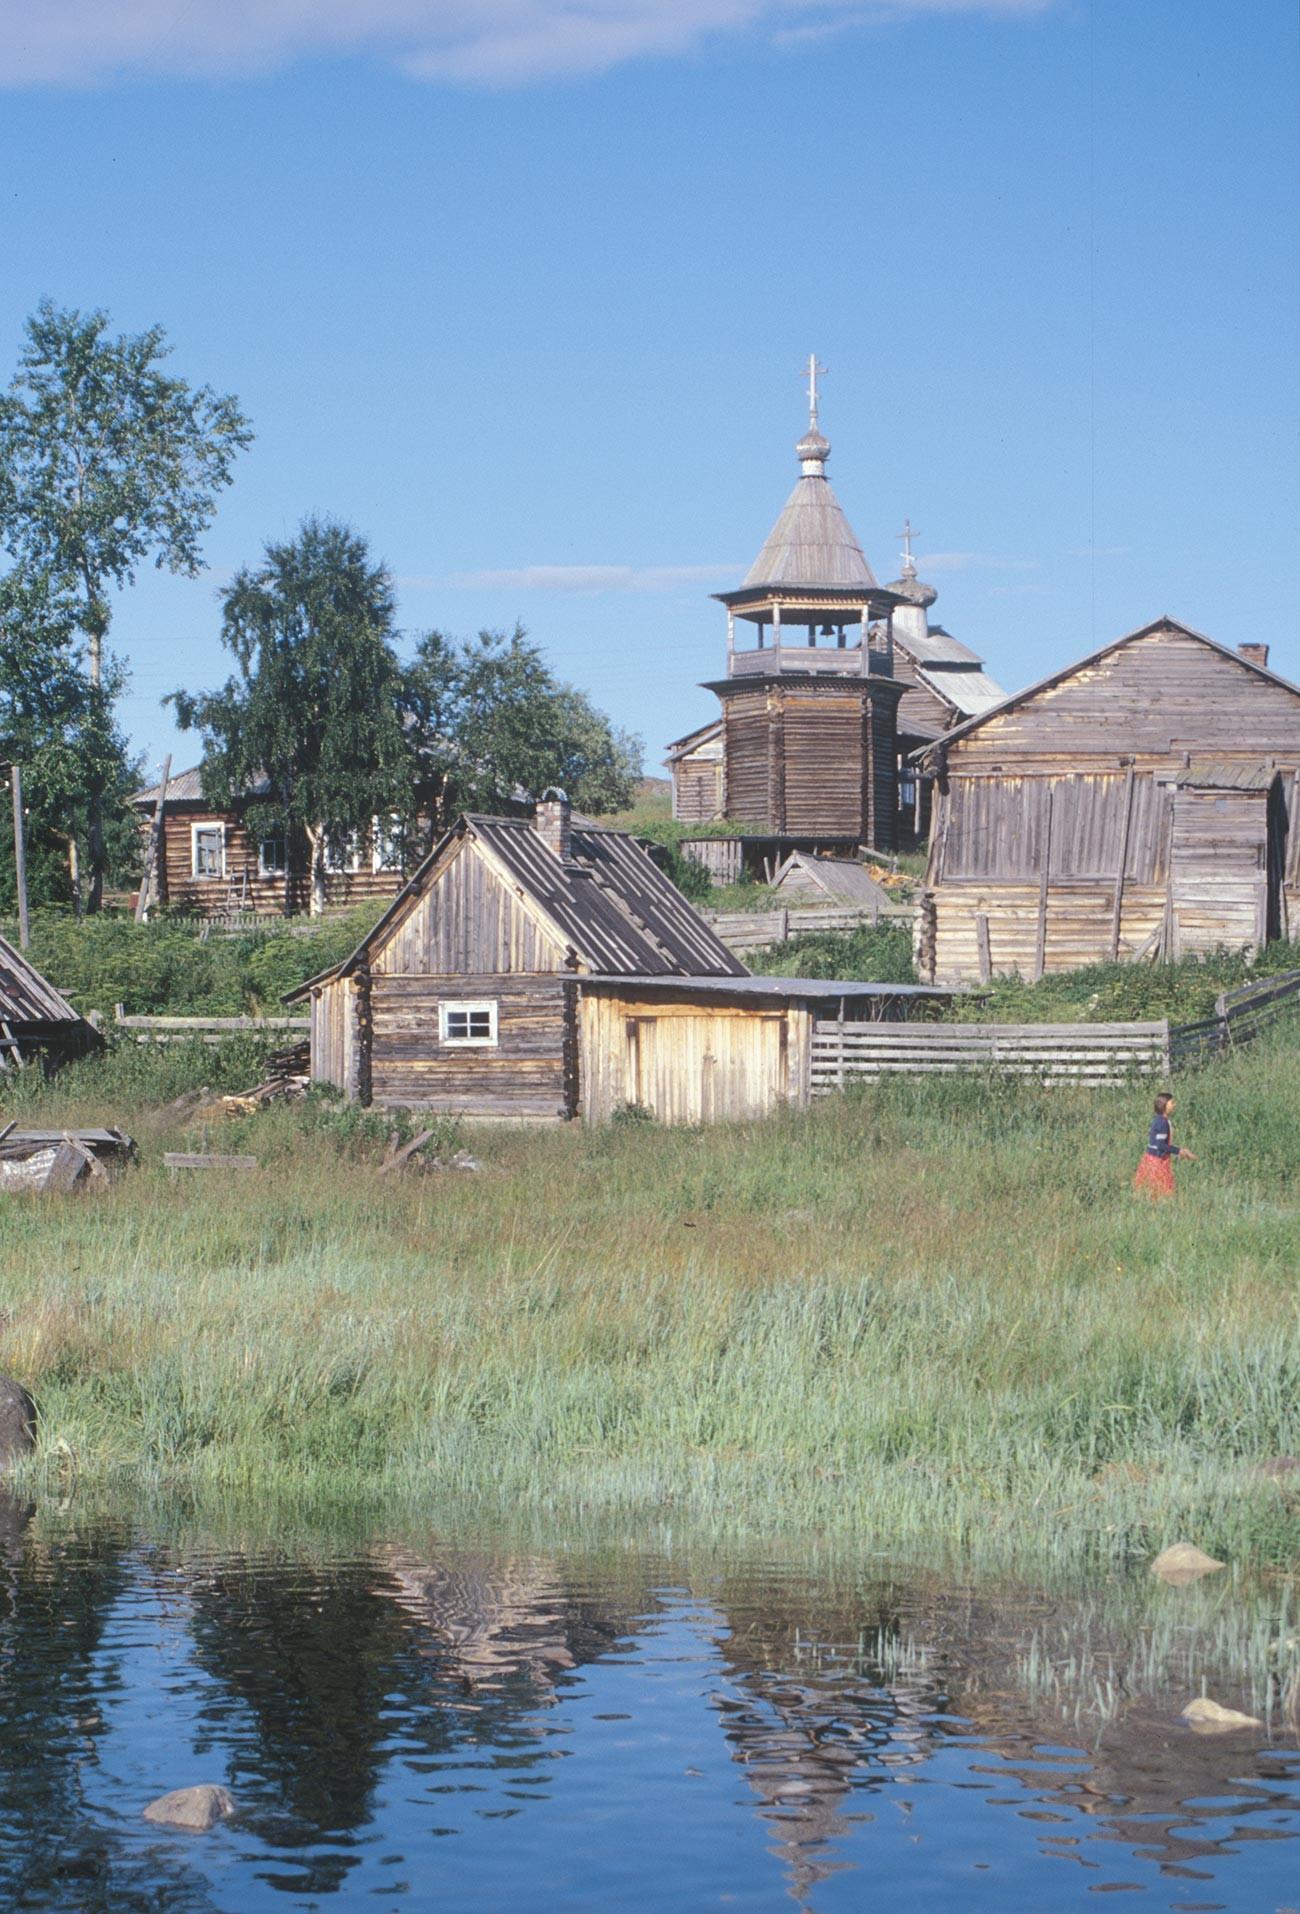 Kovda. Log house, bathhouse & barn. Background: bell tower & Church of St. Nicholas. July 24, 2001